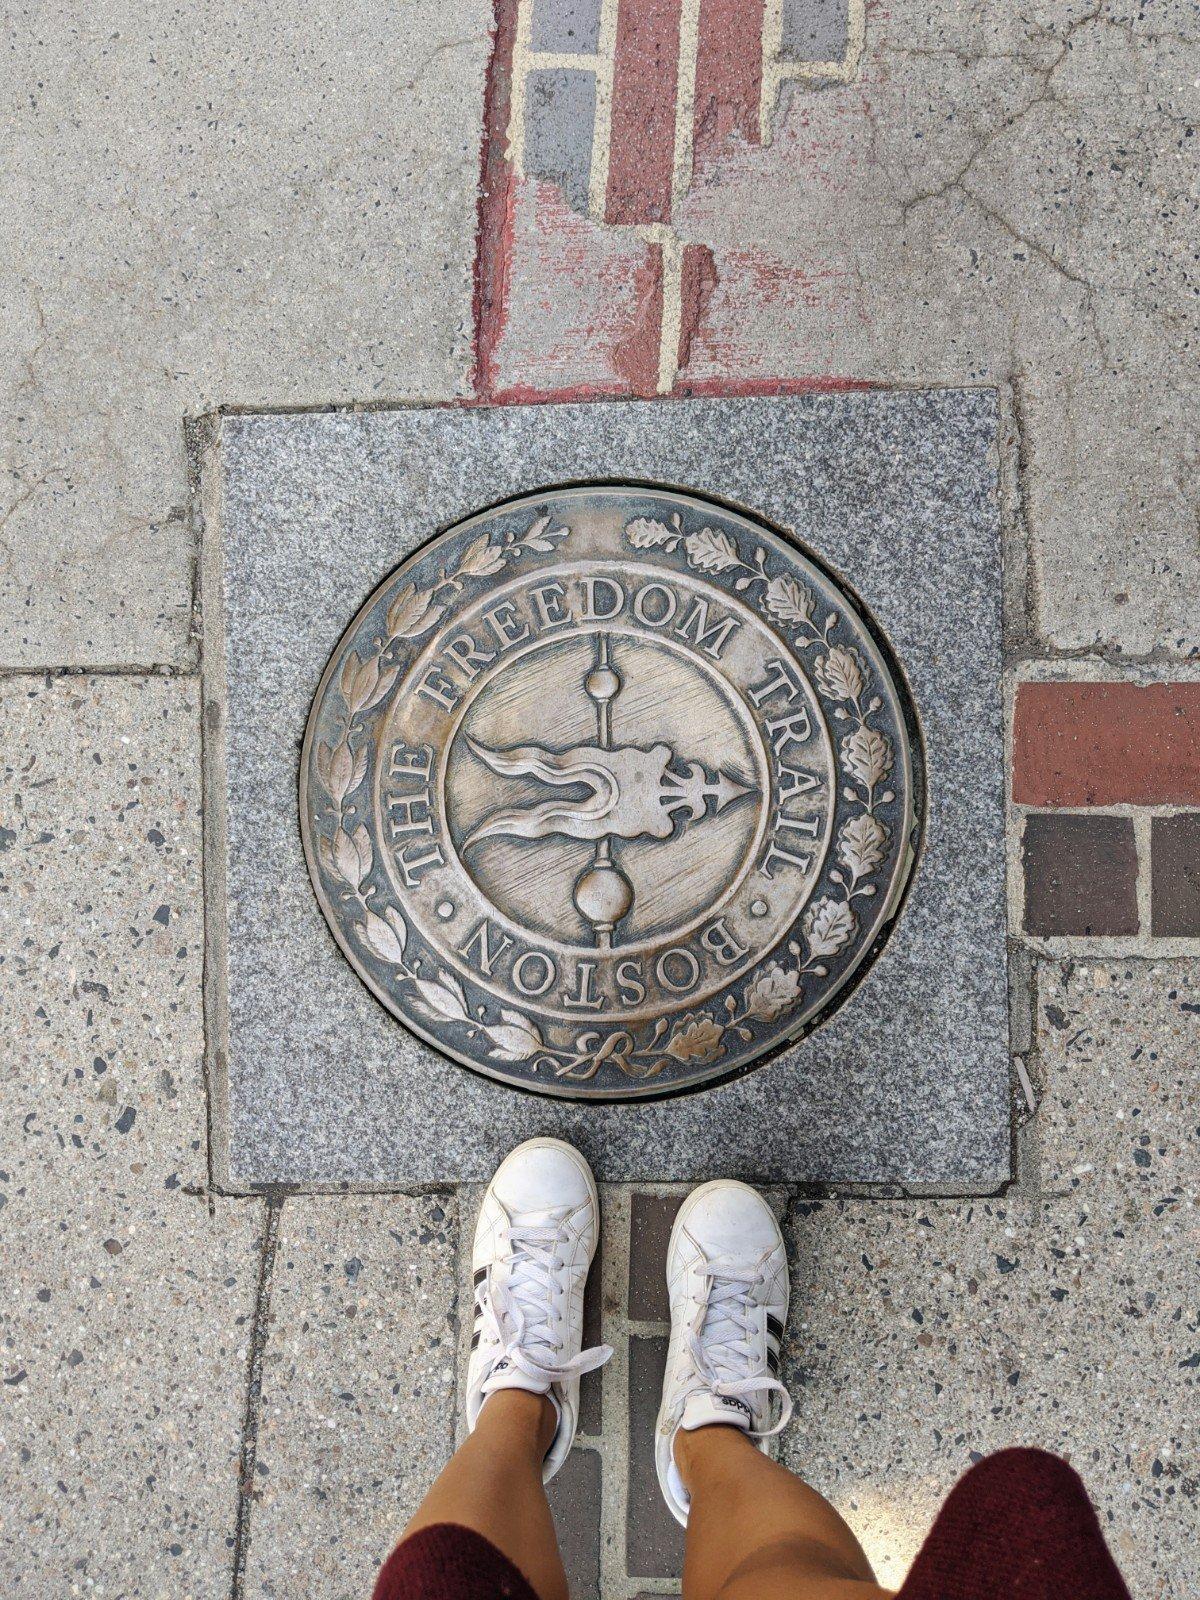 Freedom Trail symbol and bricks